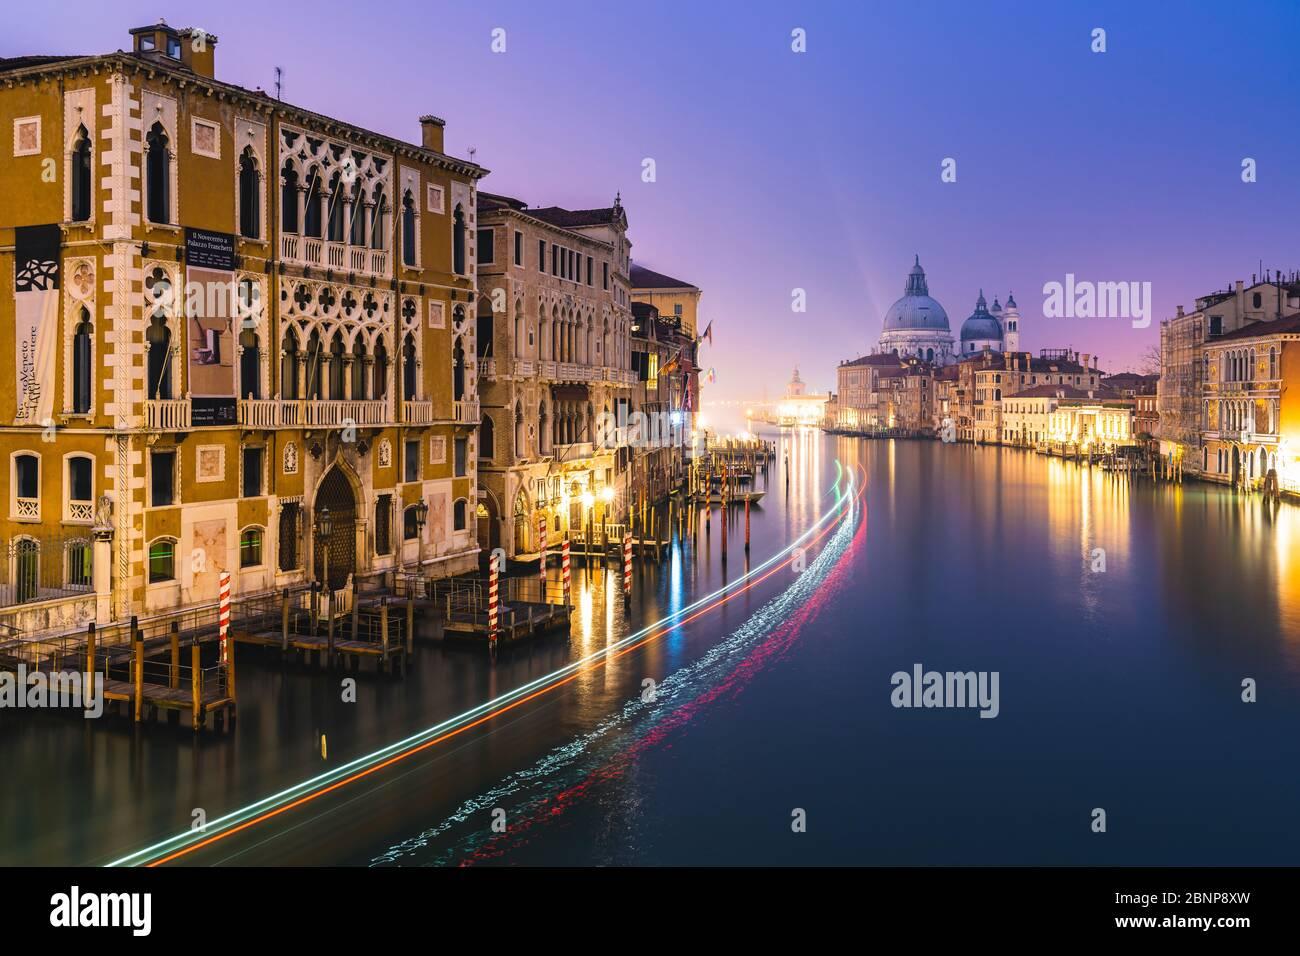 Grand Canal de nuit, Palazzo Cavalli-Franchetti, Santa Maria della Salute, Venise, centre historique, Vénétie, Italie, Nord de l'Italie, Rialto, Europe Banque D'Images